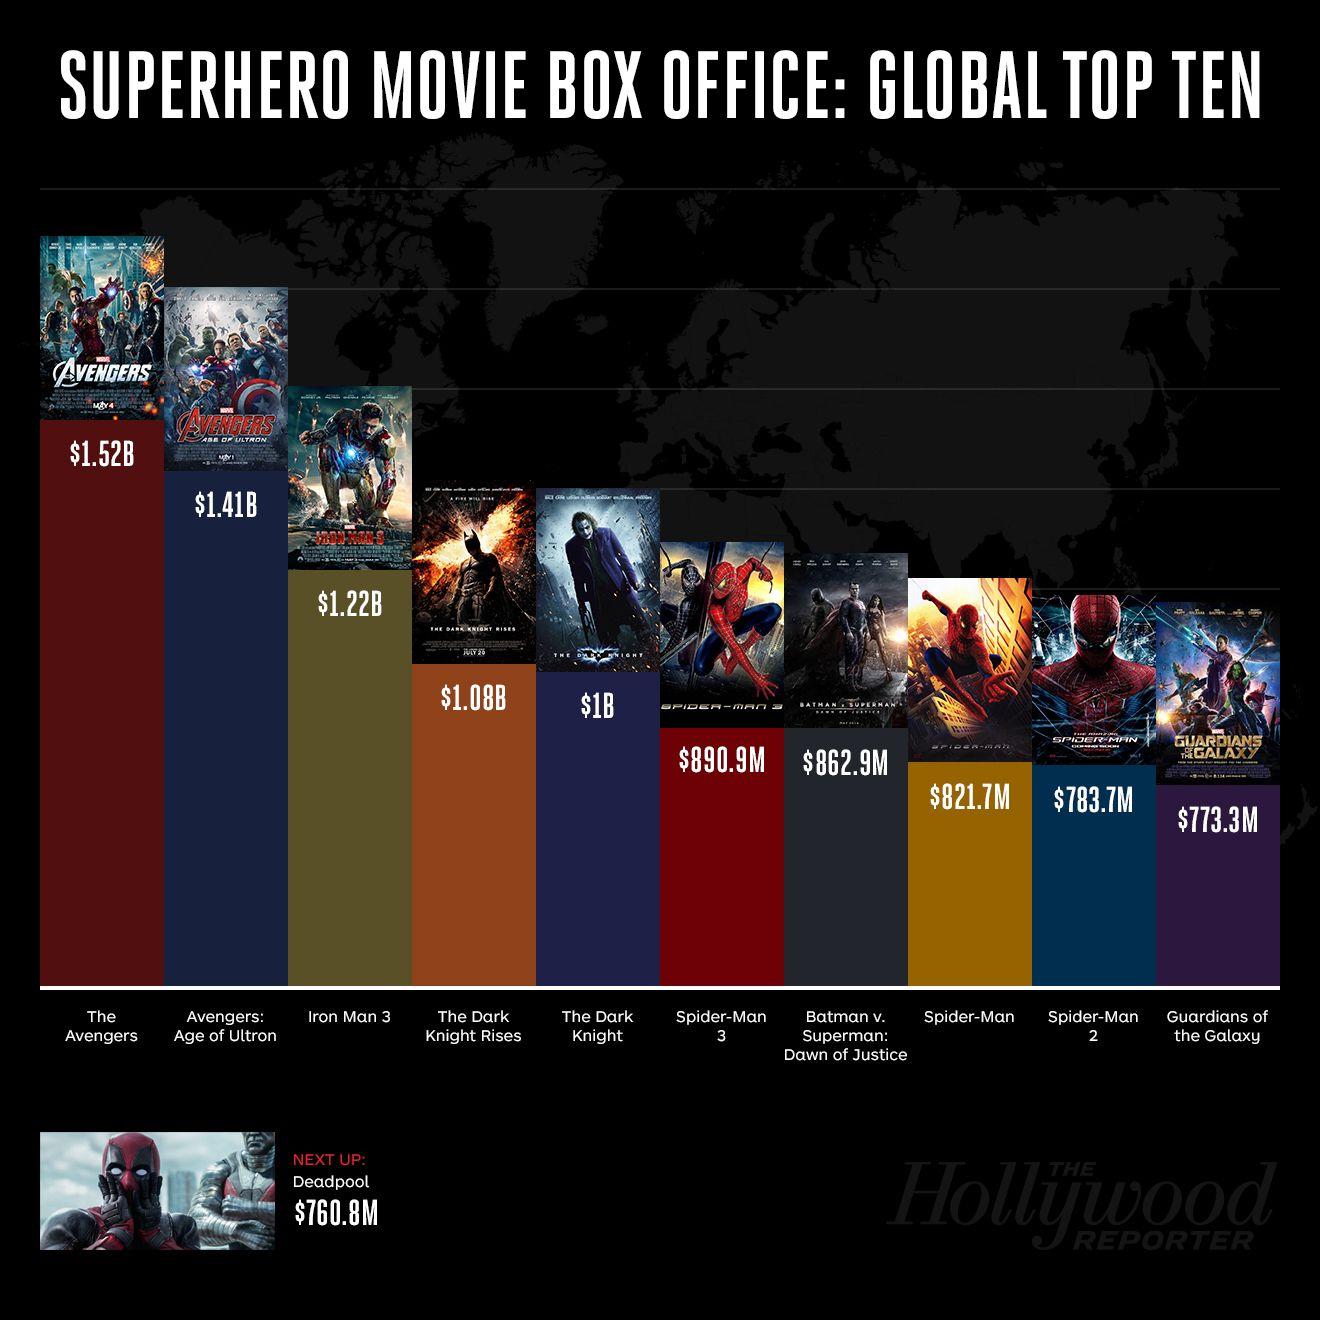 Box Office The Verdict for 'Batman v. Superman Dawn of